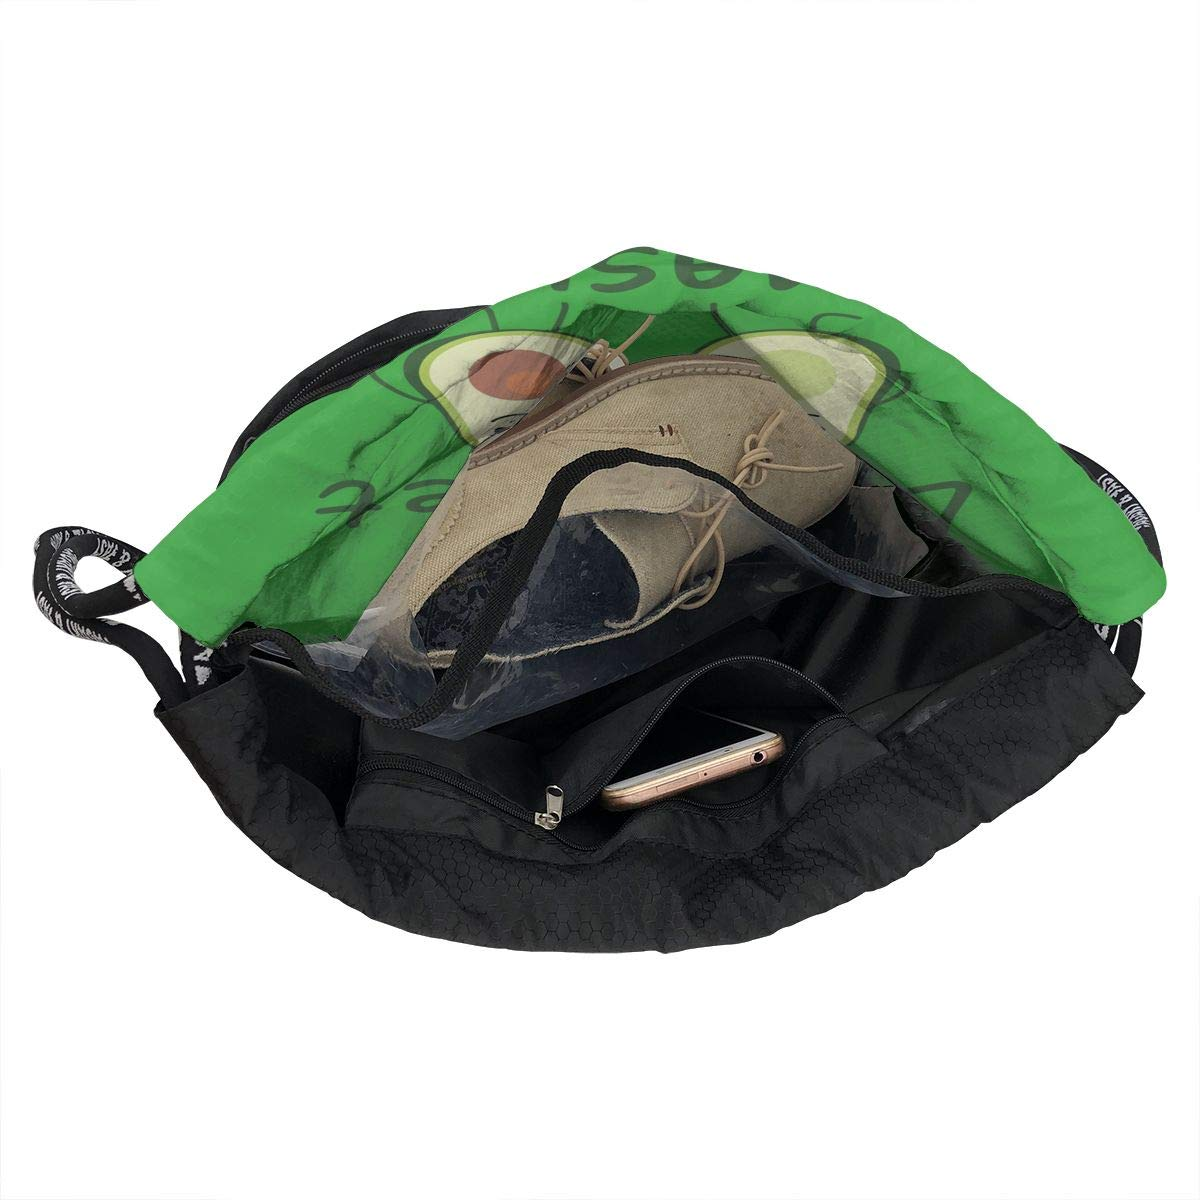 Fashion Outdoor Zipper Drawstring Bag Avocado Lets Get Smashed Printed Bundle Backpack Unisex Multi-Function Backpack